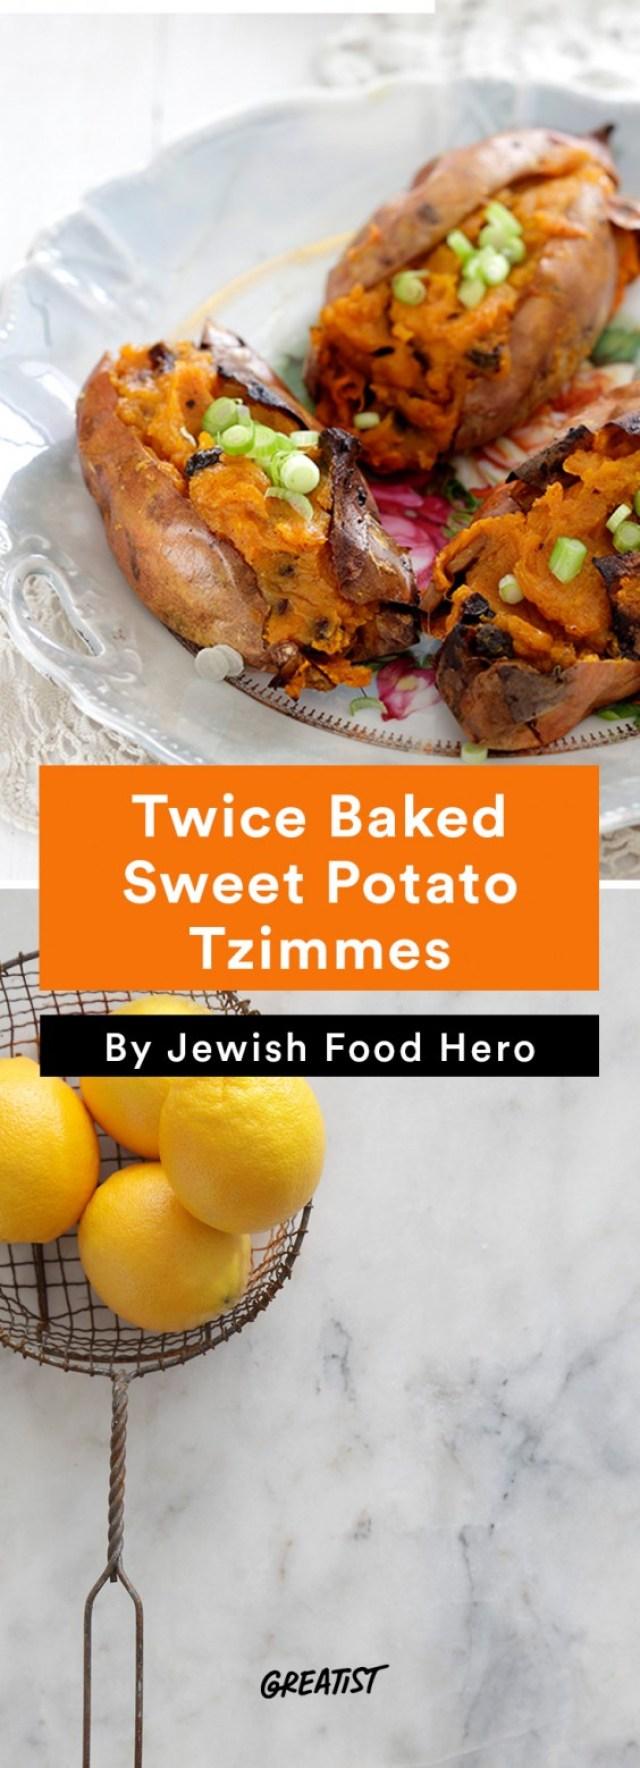 jewish food hero: Sweet Potato Tzimmes